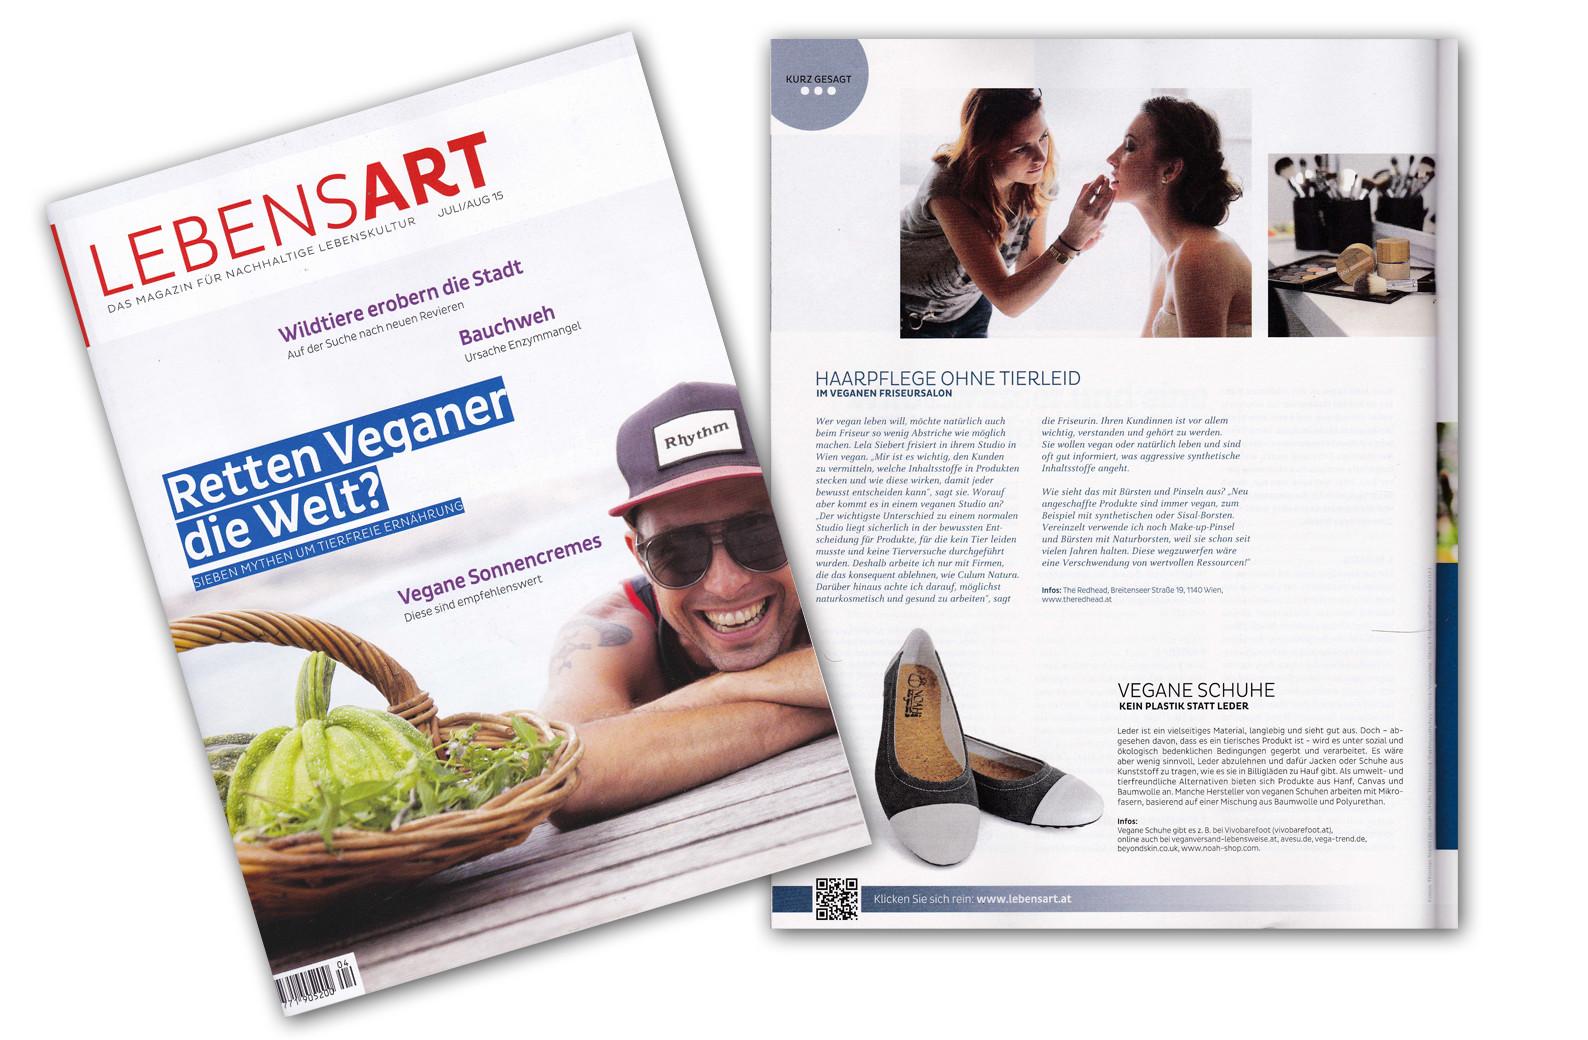 Lebensart | Mai 2015 - www.lebensart.at